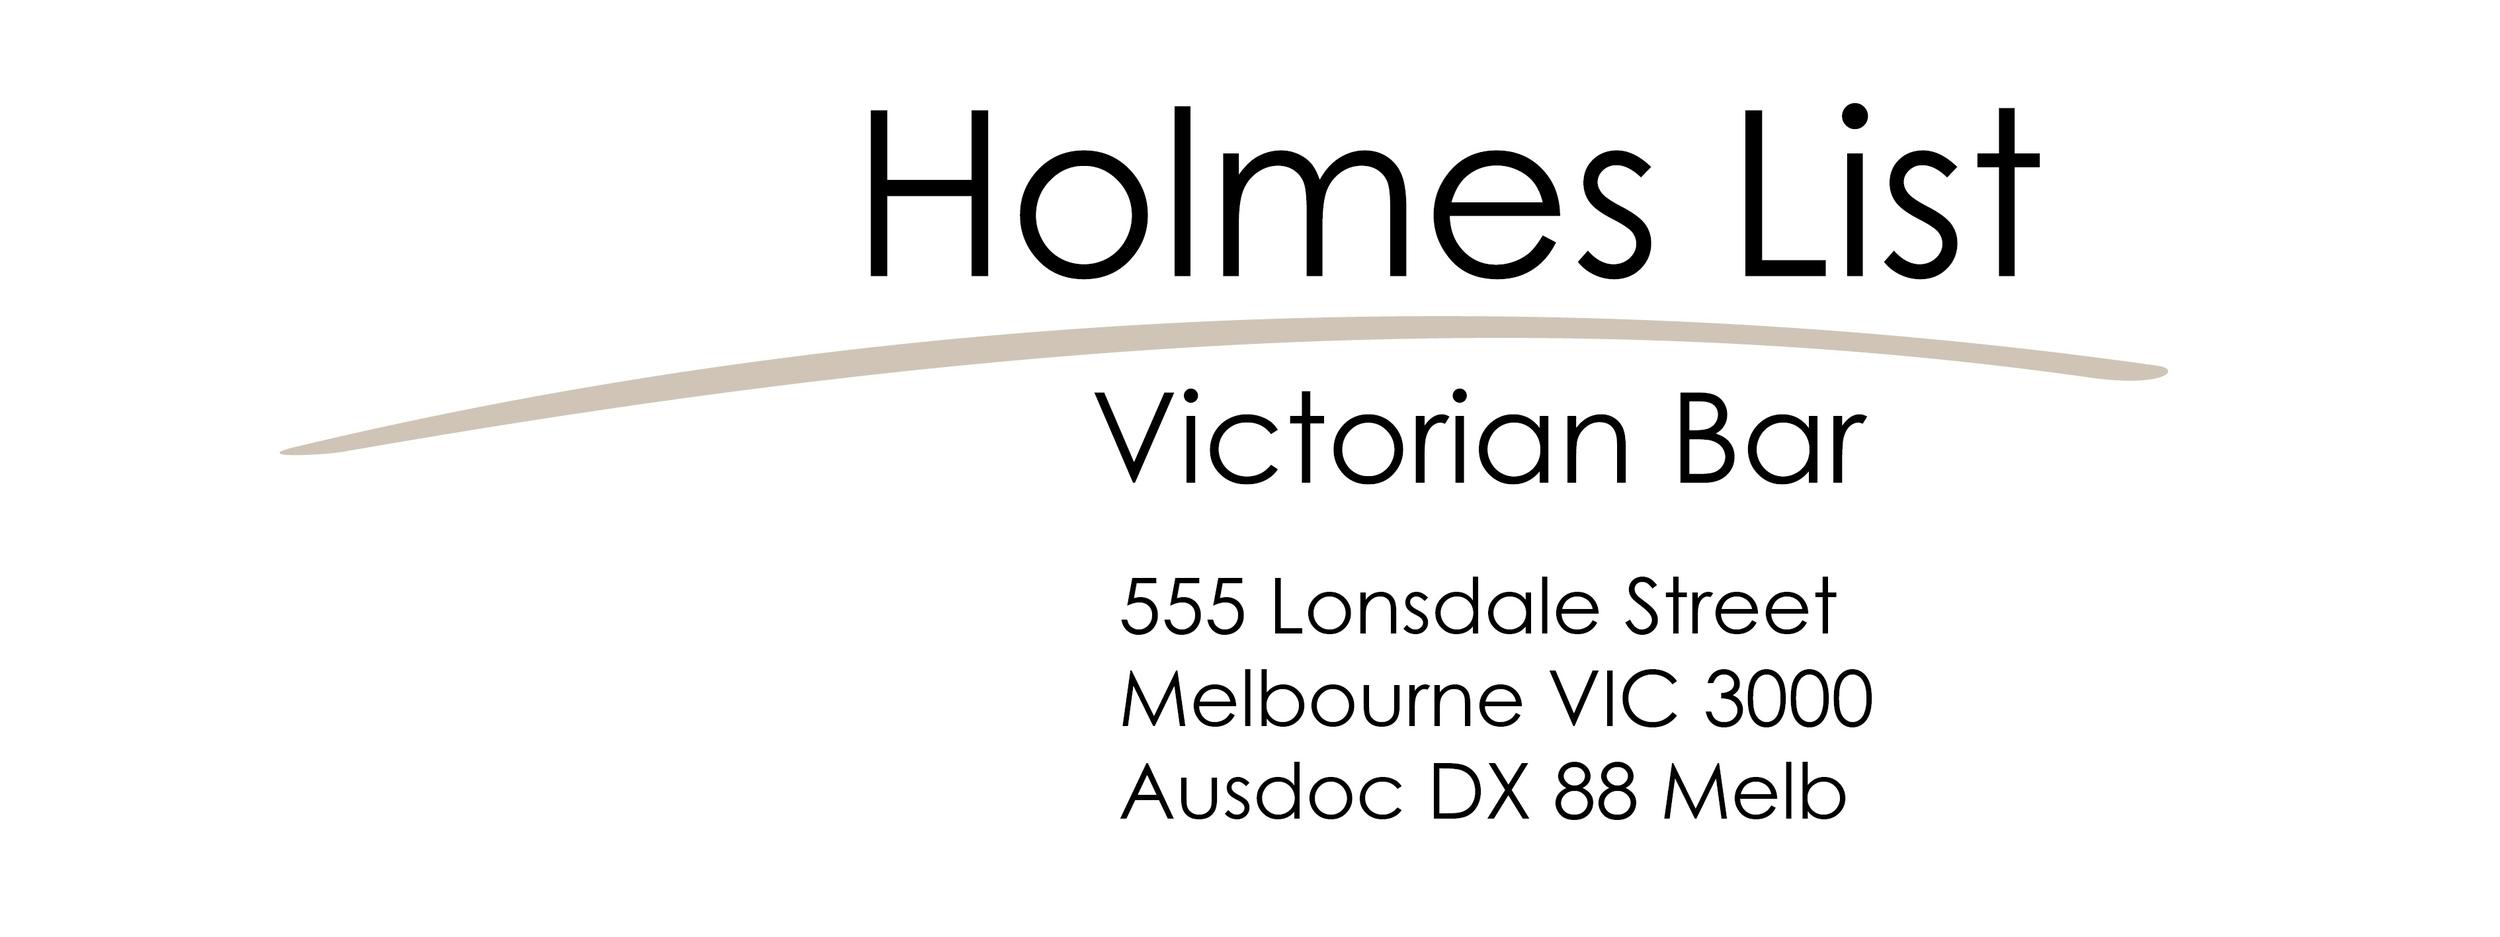 _new_holmes_list_logo.jpg